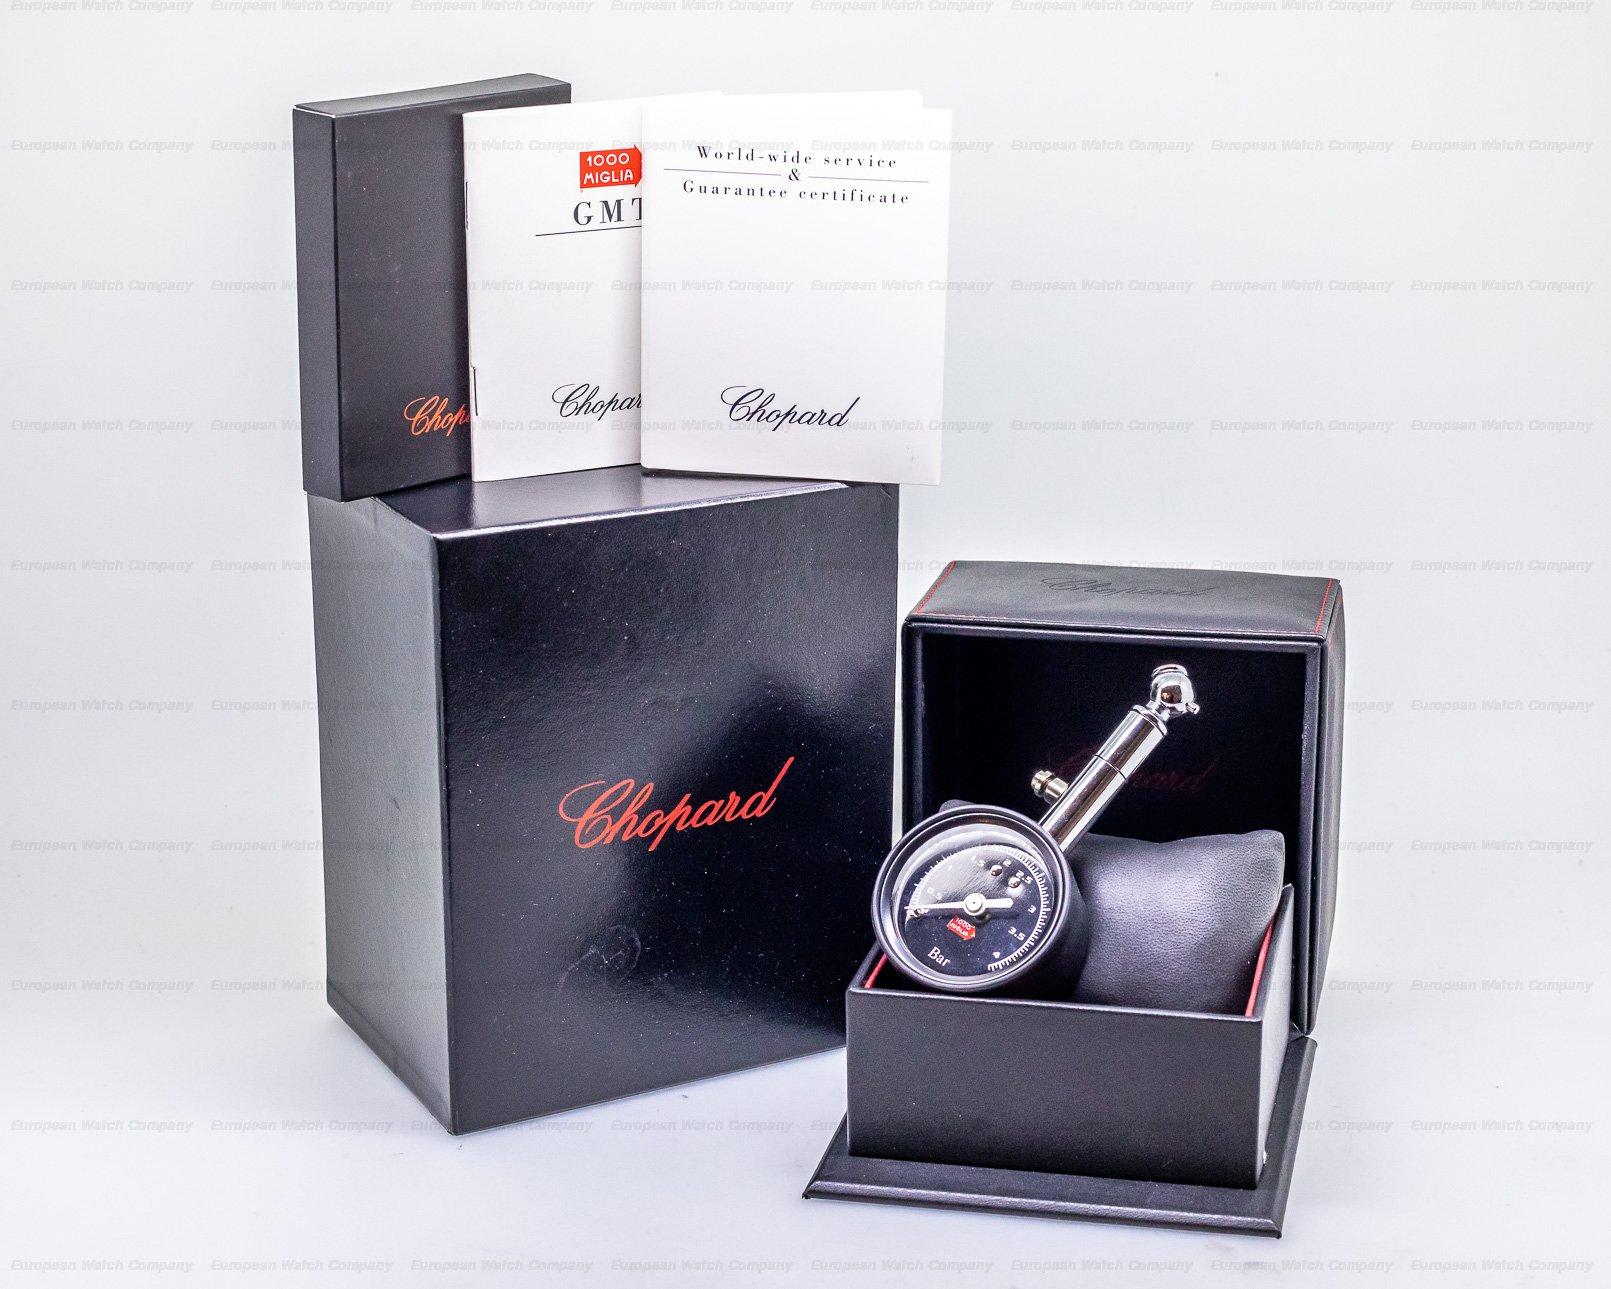 Chopard 8954 Limited Edition 2004 Mille Miglia Chrono GMT